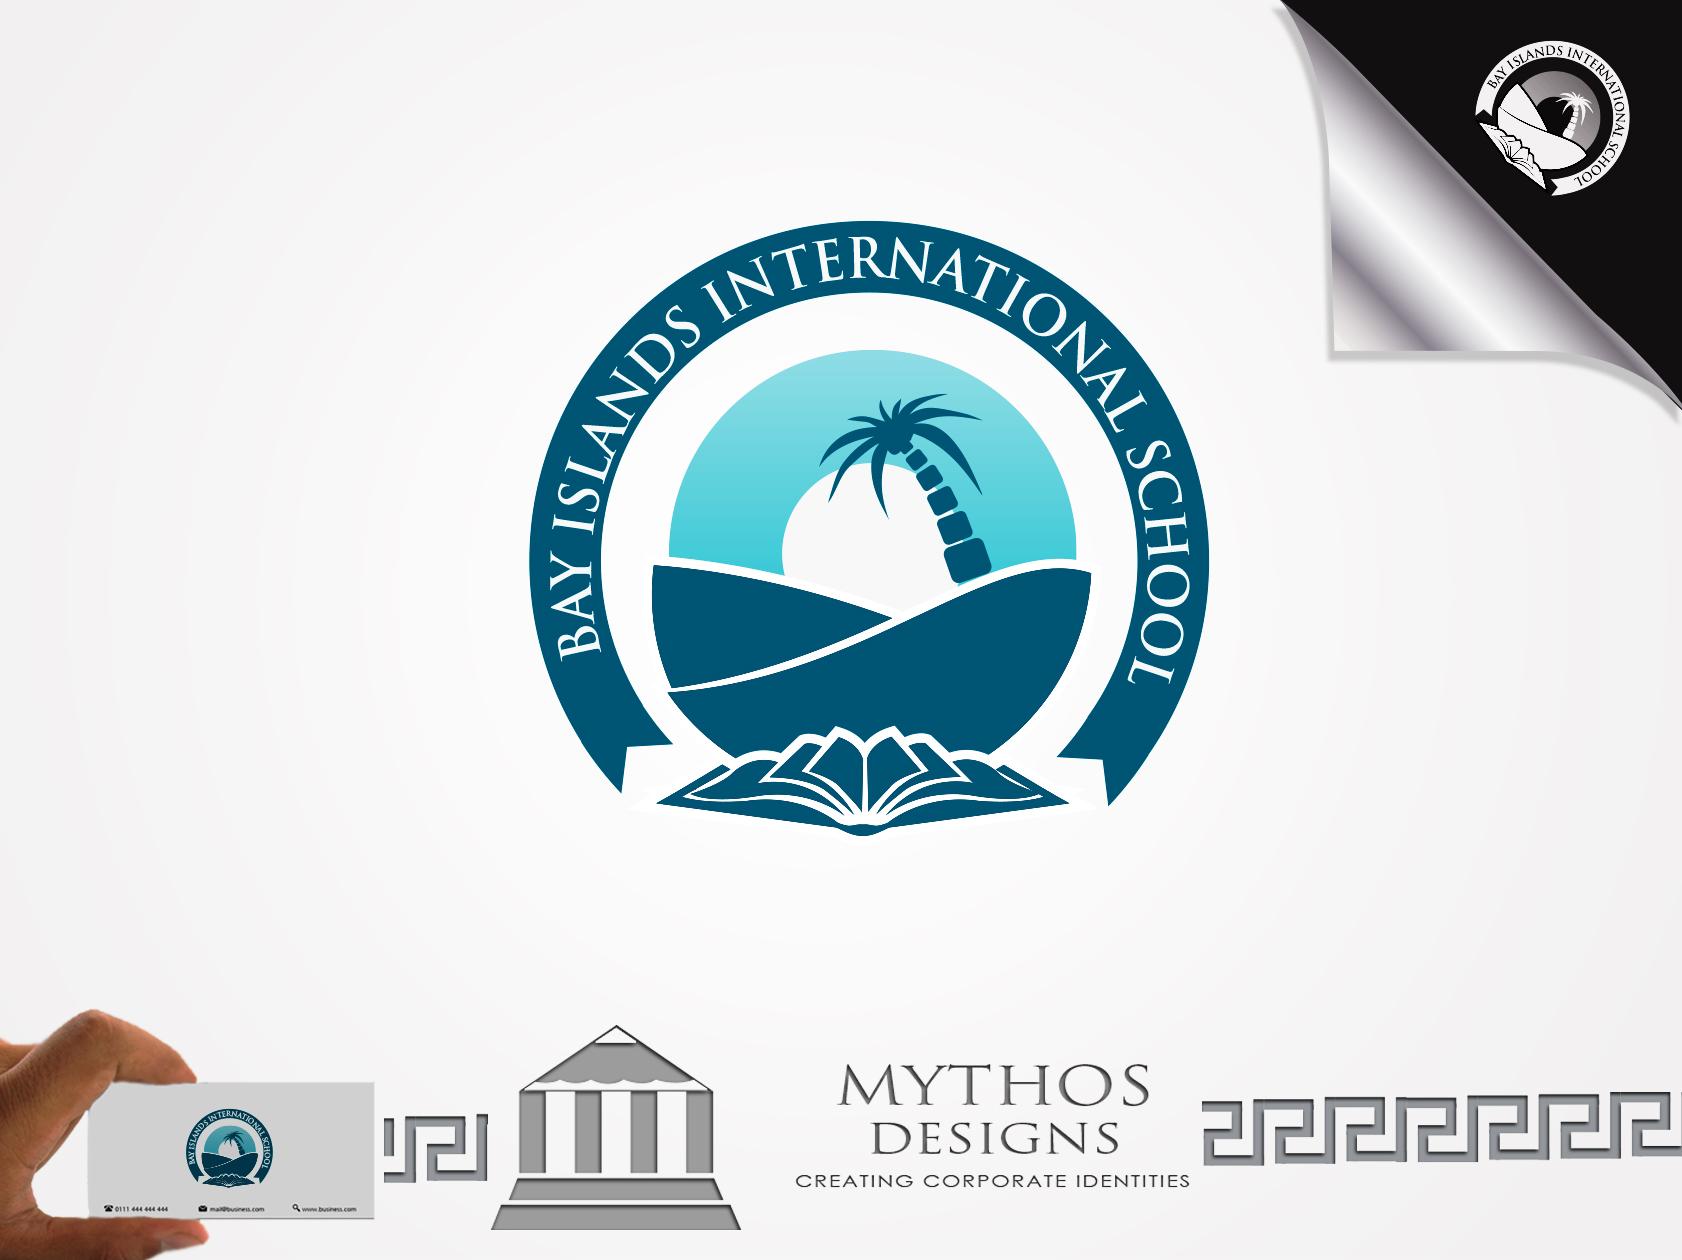 Logo Design by Mythos Designs - Entry No. 65 in the Logo Design Contest Creative Logo Design for Bay Islands International School.